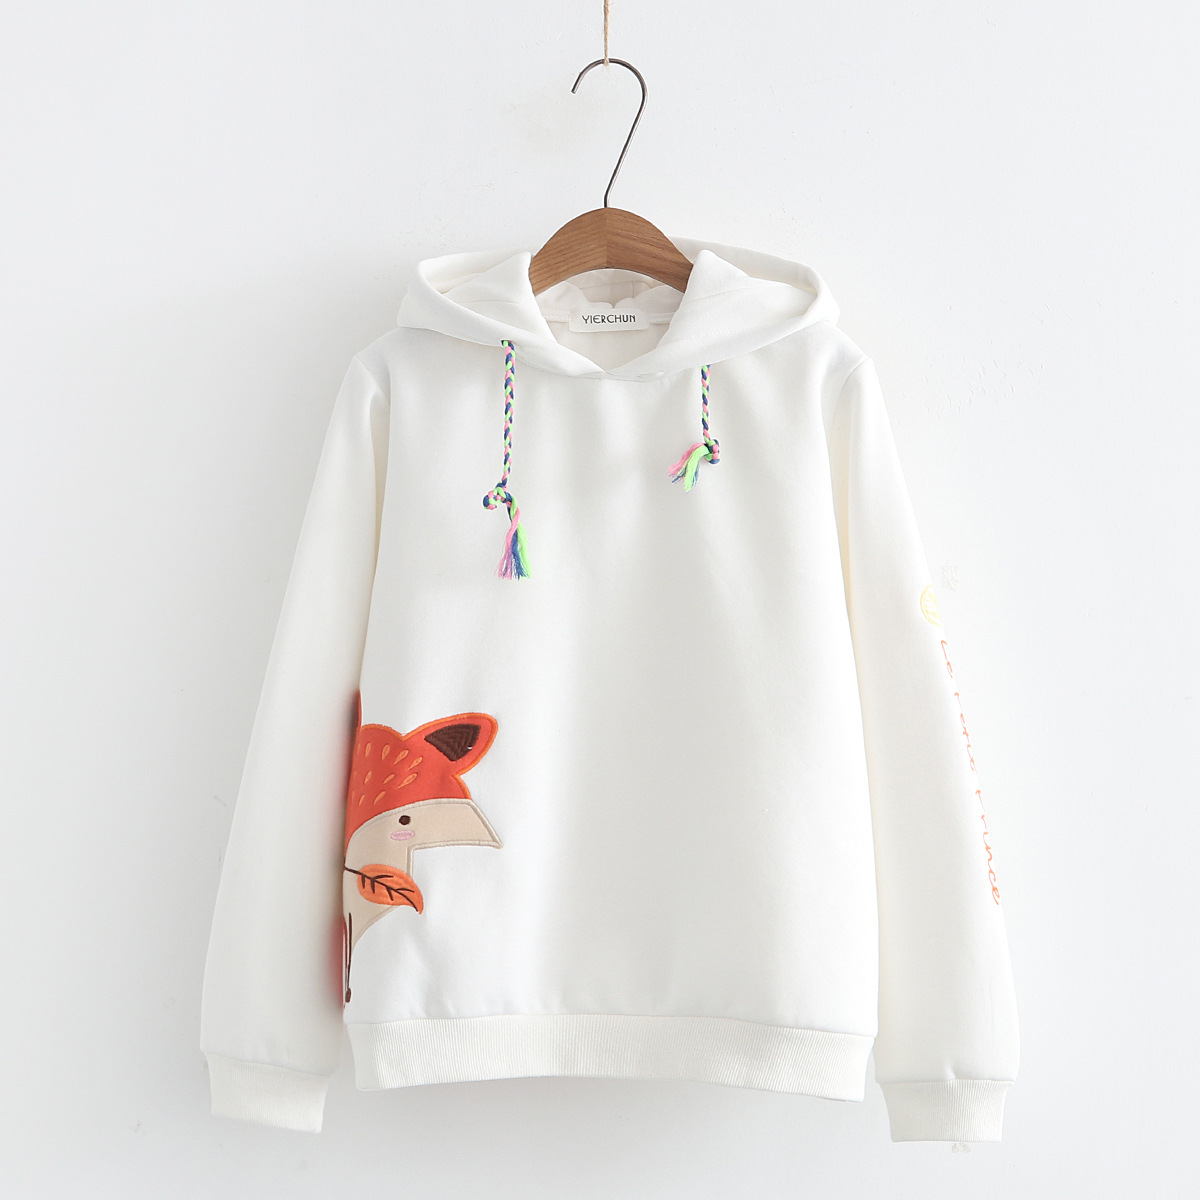 2018 Autumn Winter Kpop New Mori Girl Women Hoodies Coat Printed Embroidery Fox White Thicken Plus Velvet Hooded Sweatshirt Tops